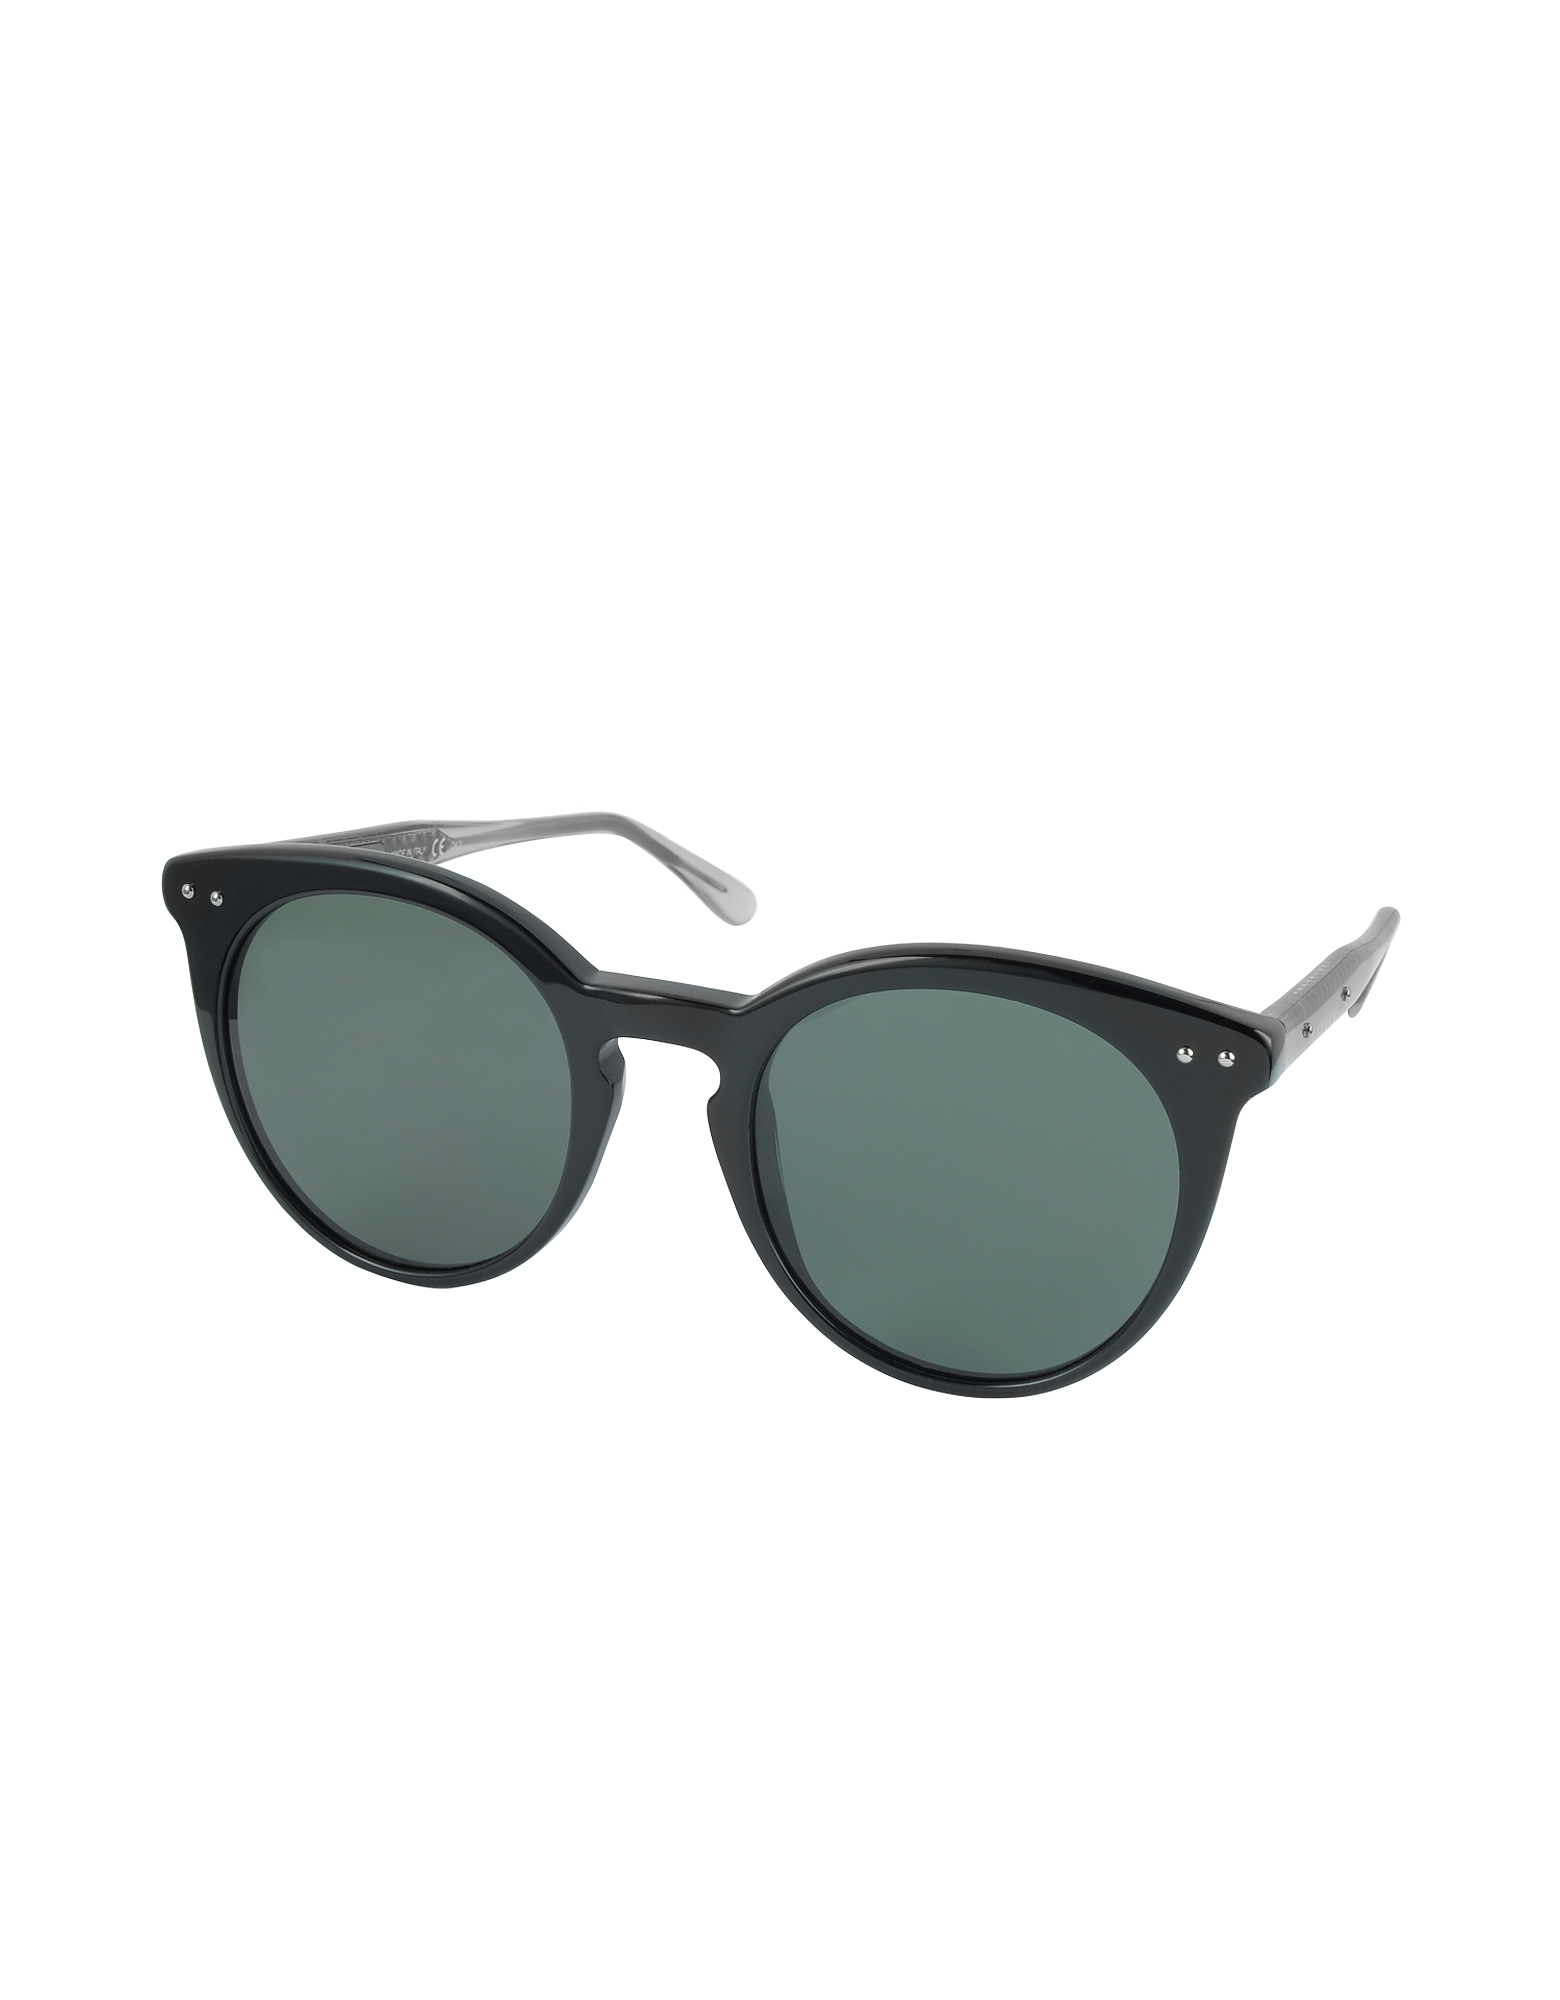 BV0096S Round Acetate Women's Sunglasses от Forzieri.com INT